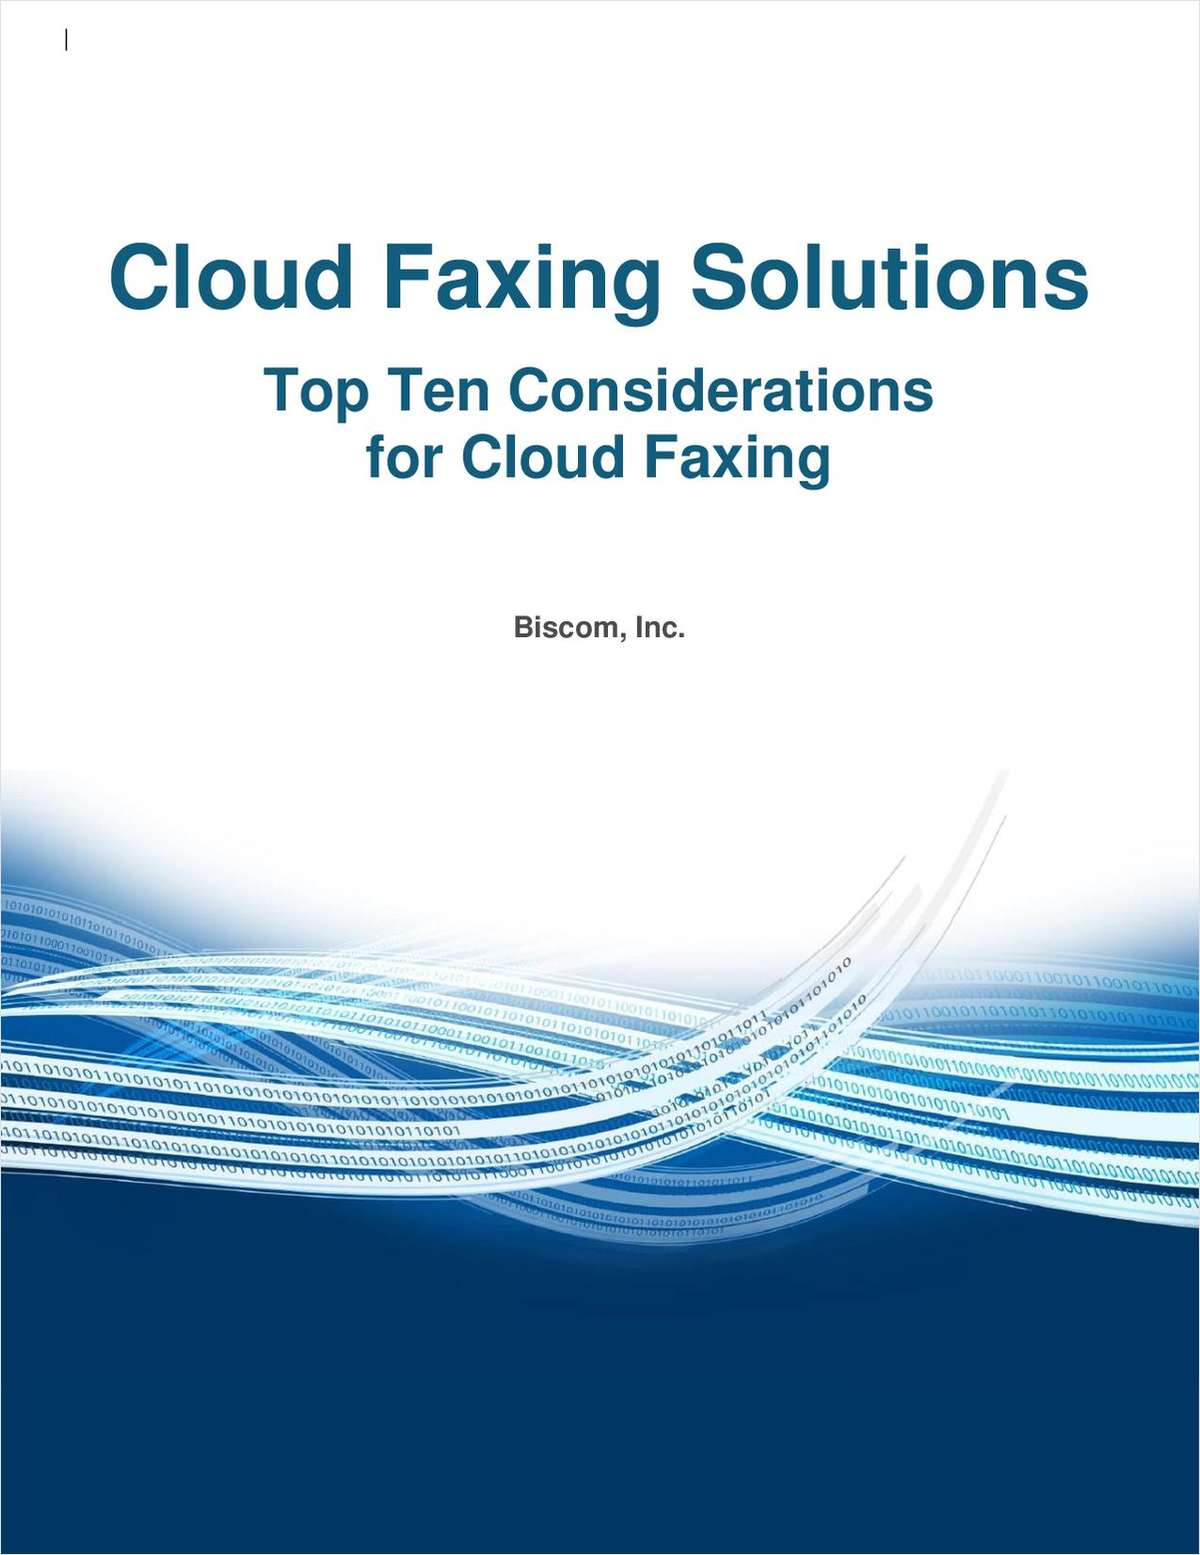 Top Ten Considerations for Cloud Faxing